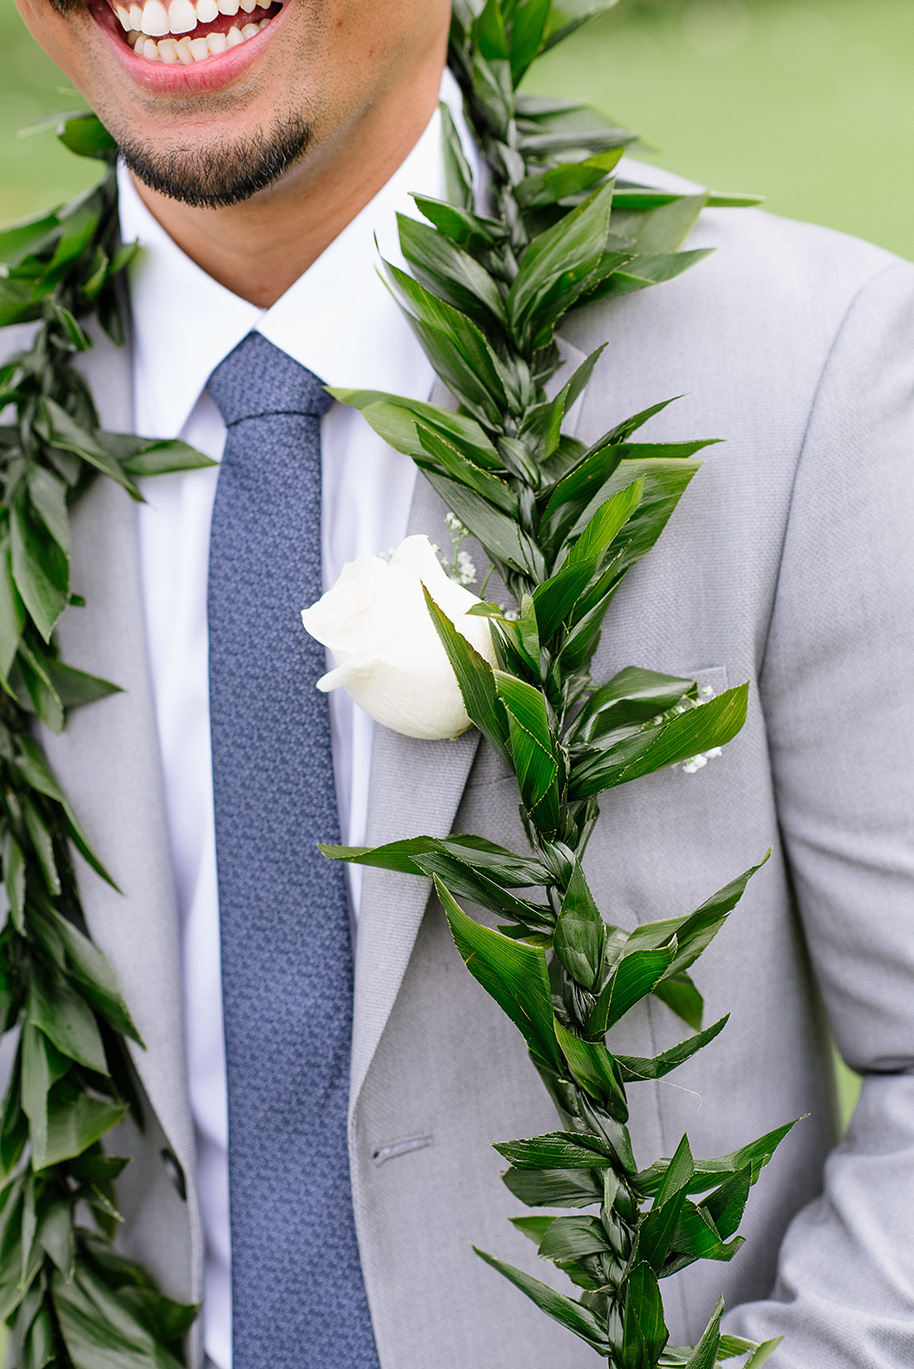 Maui-Wedding-052416-22